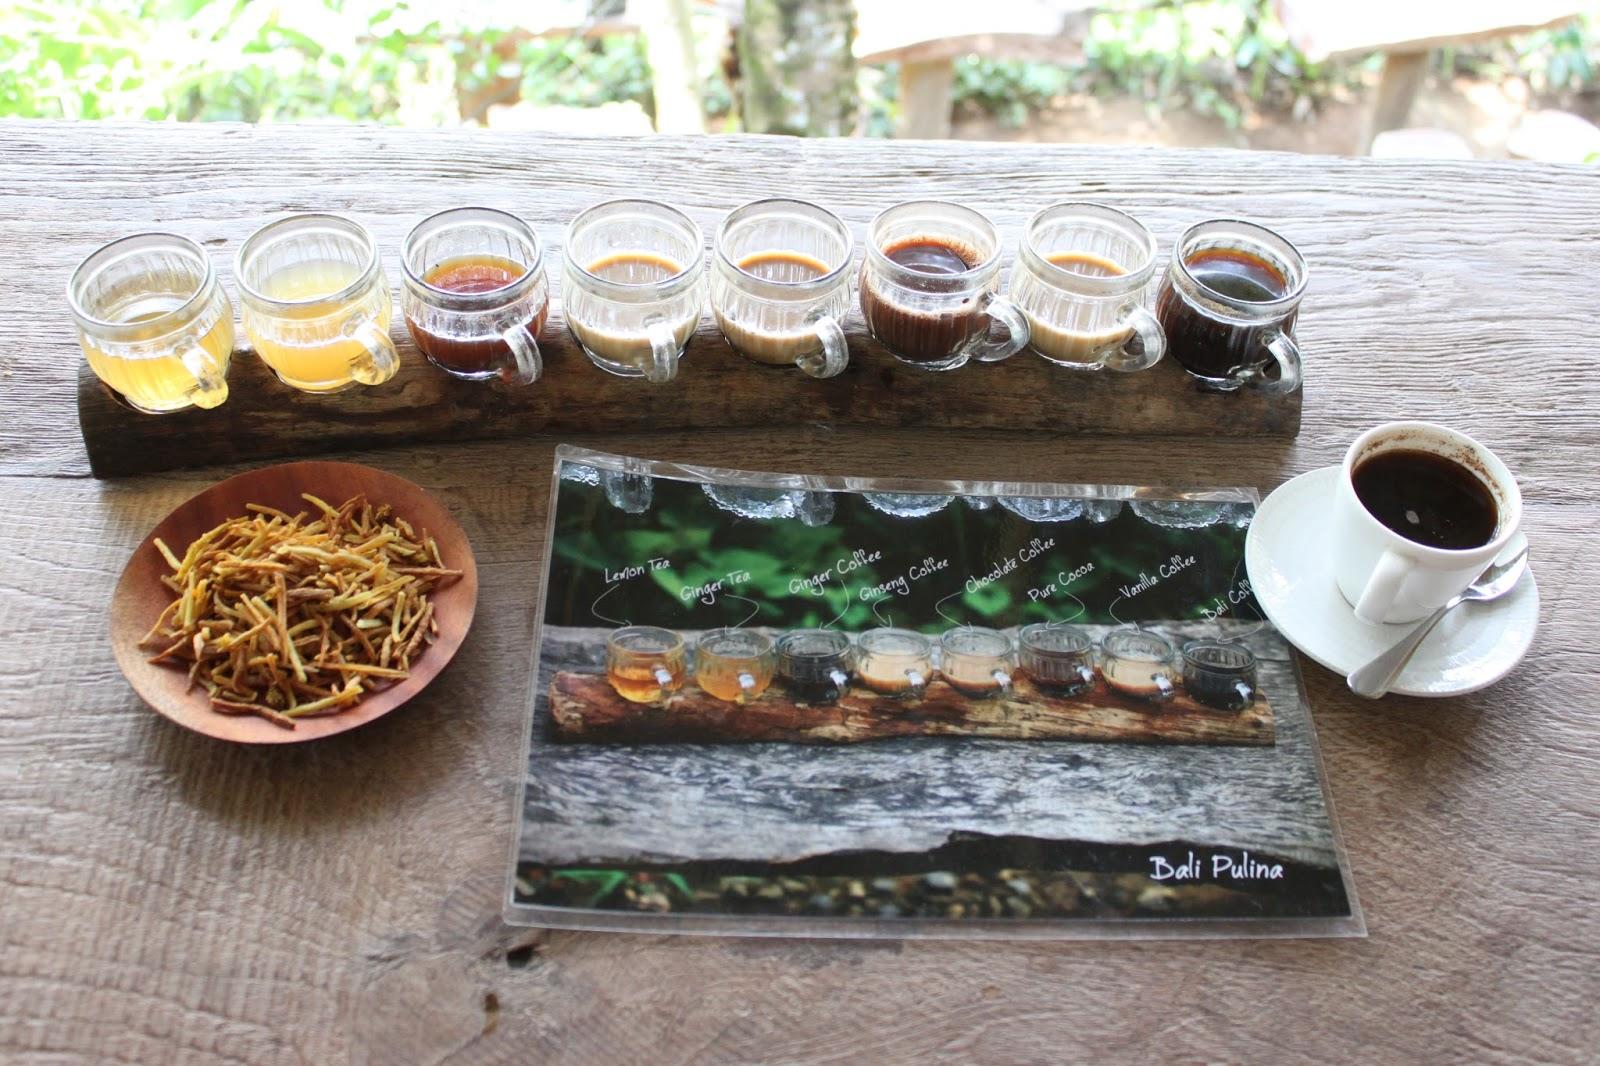 Paket Bali Pulina Nikmati Liburan Agro Wisata Sambil Menikmati Kopi